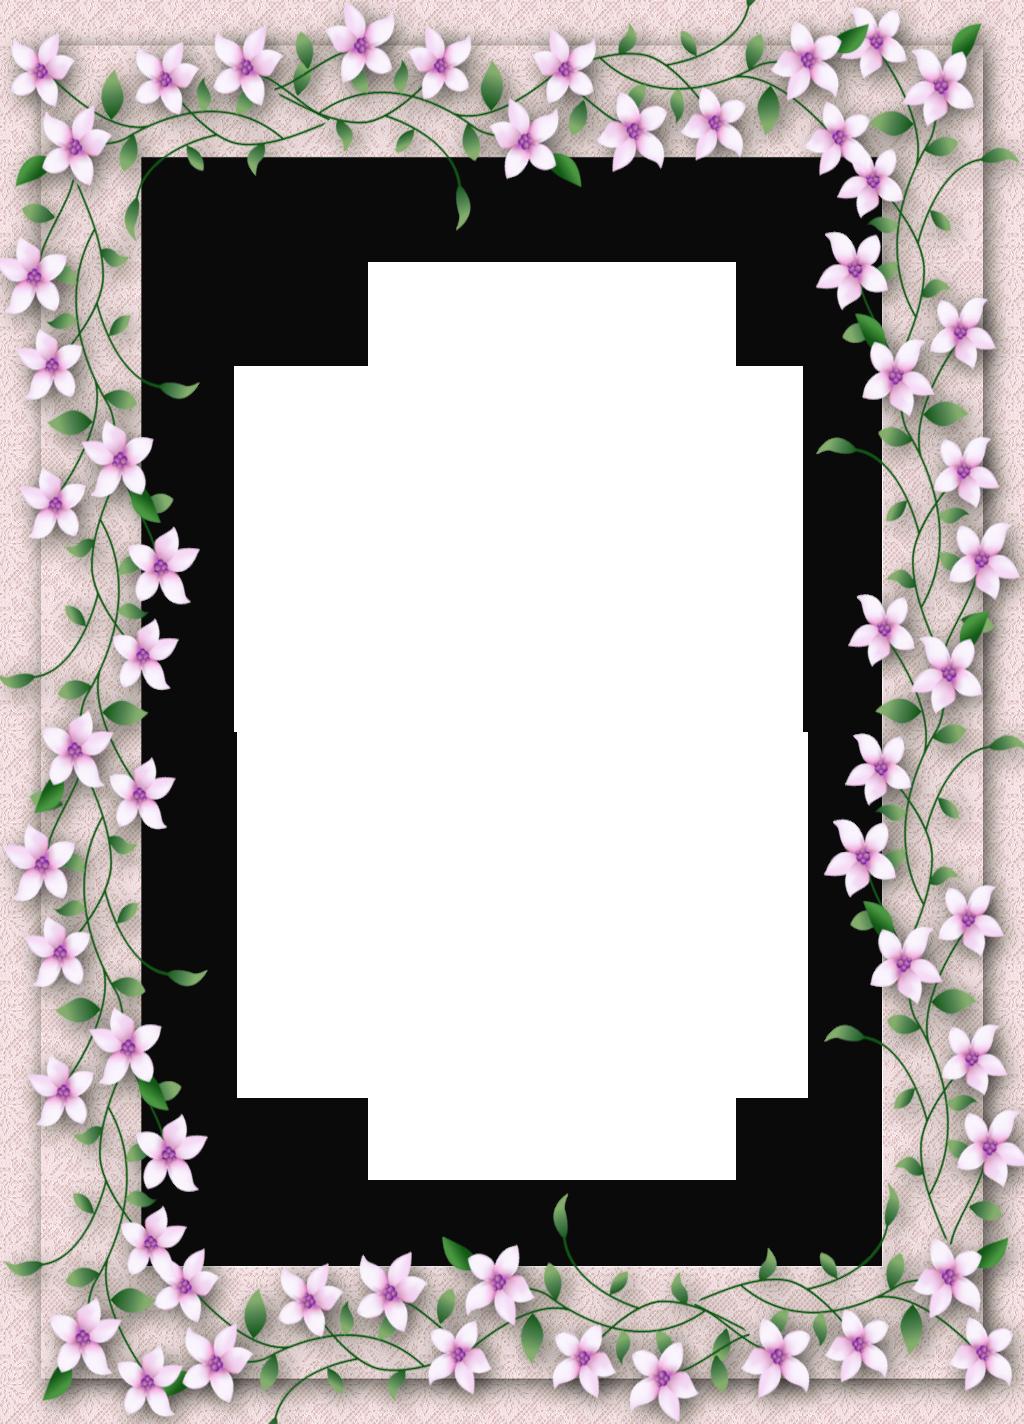 Delicate PNG Transparent Flower Frame Ramki, Ramka, Kwiaty